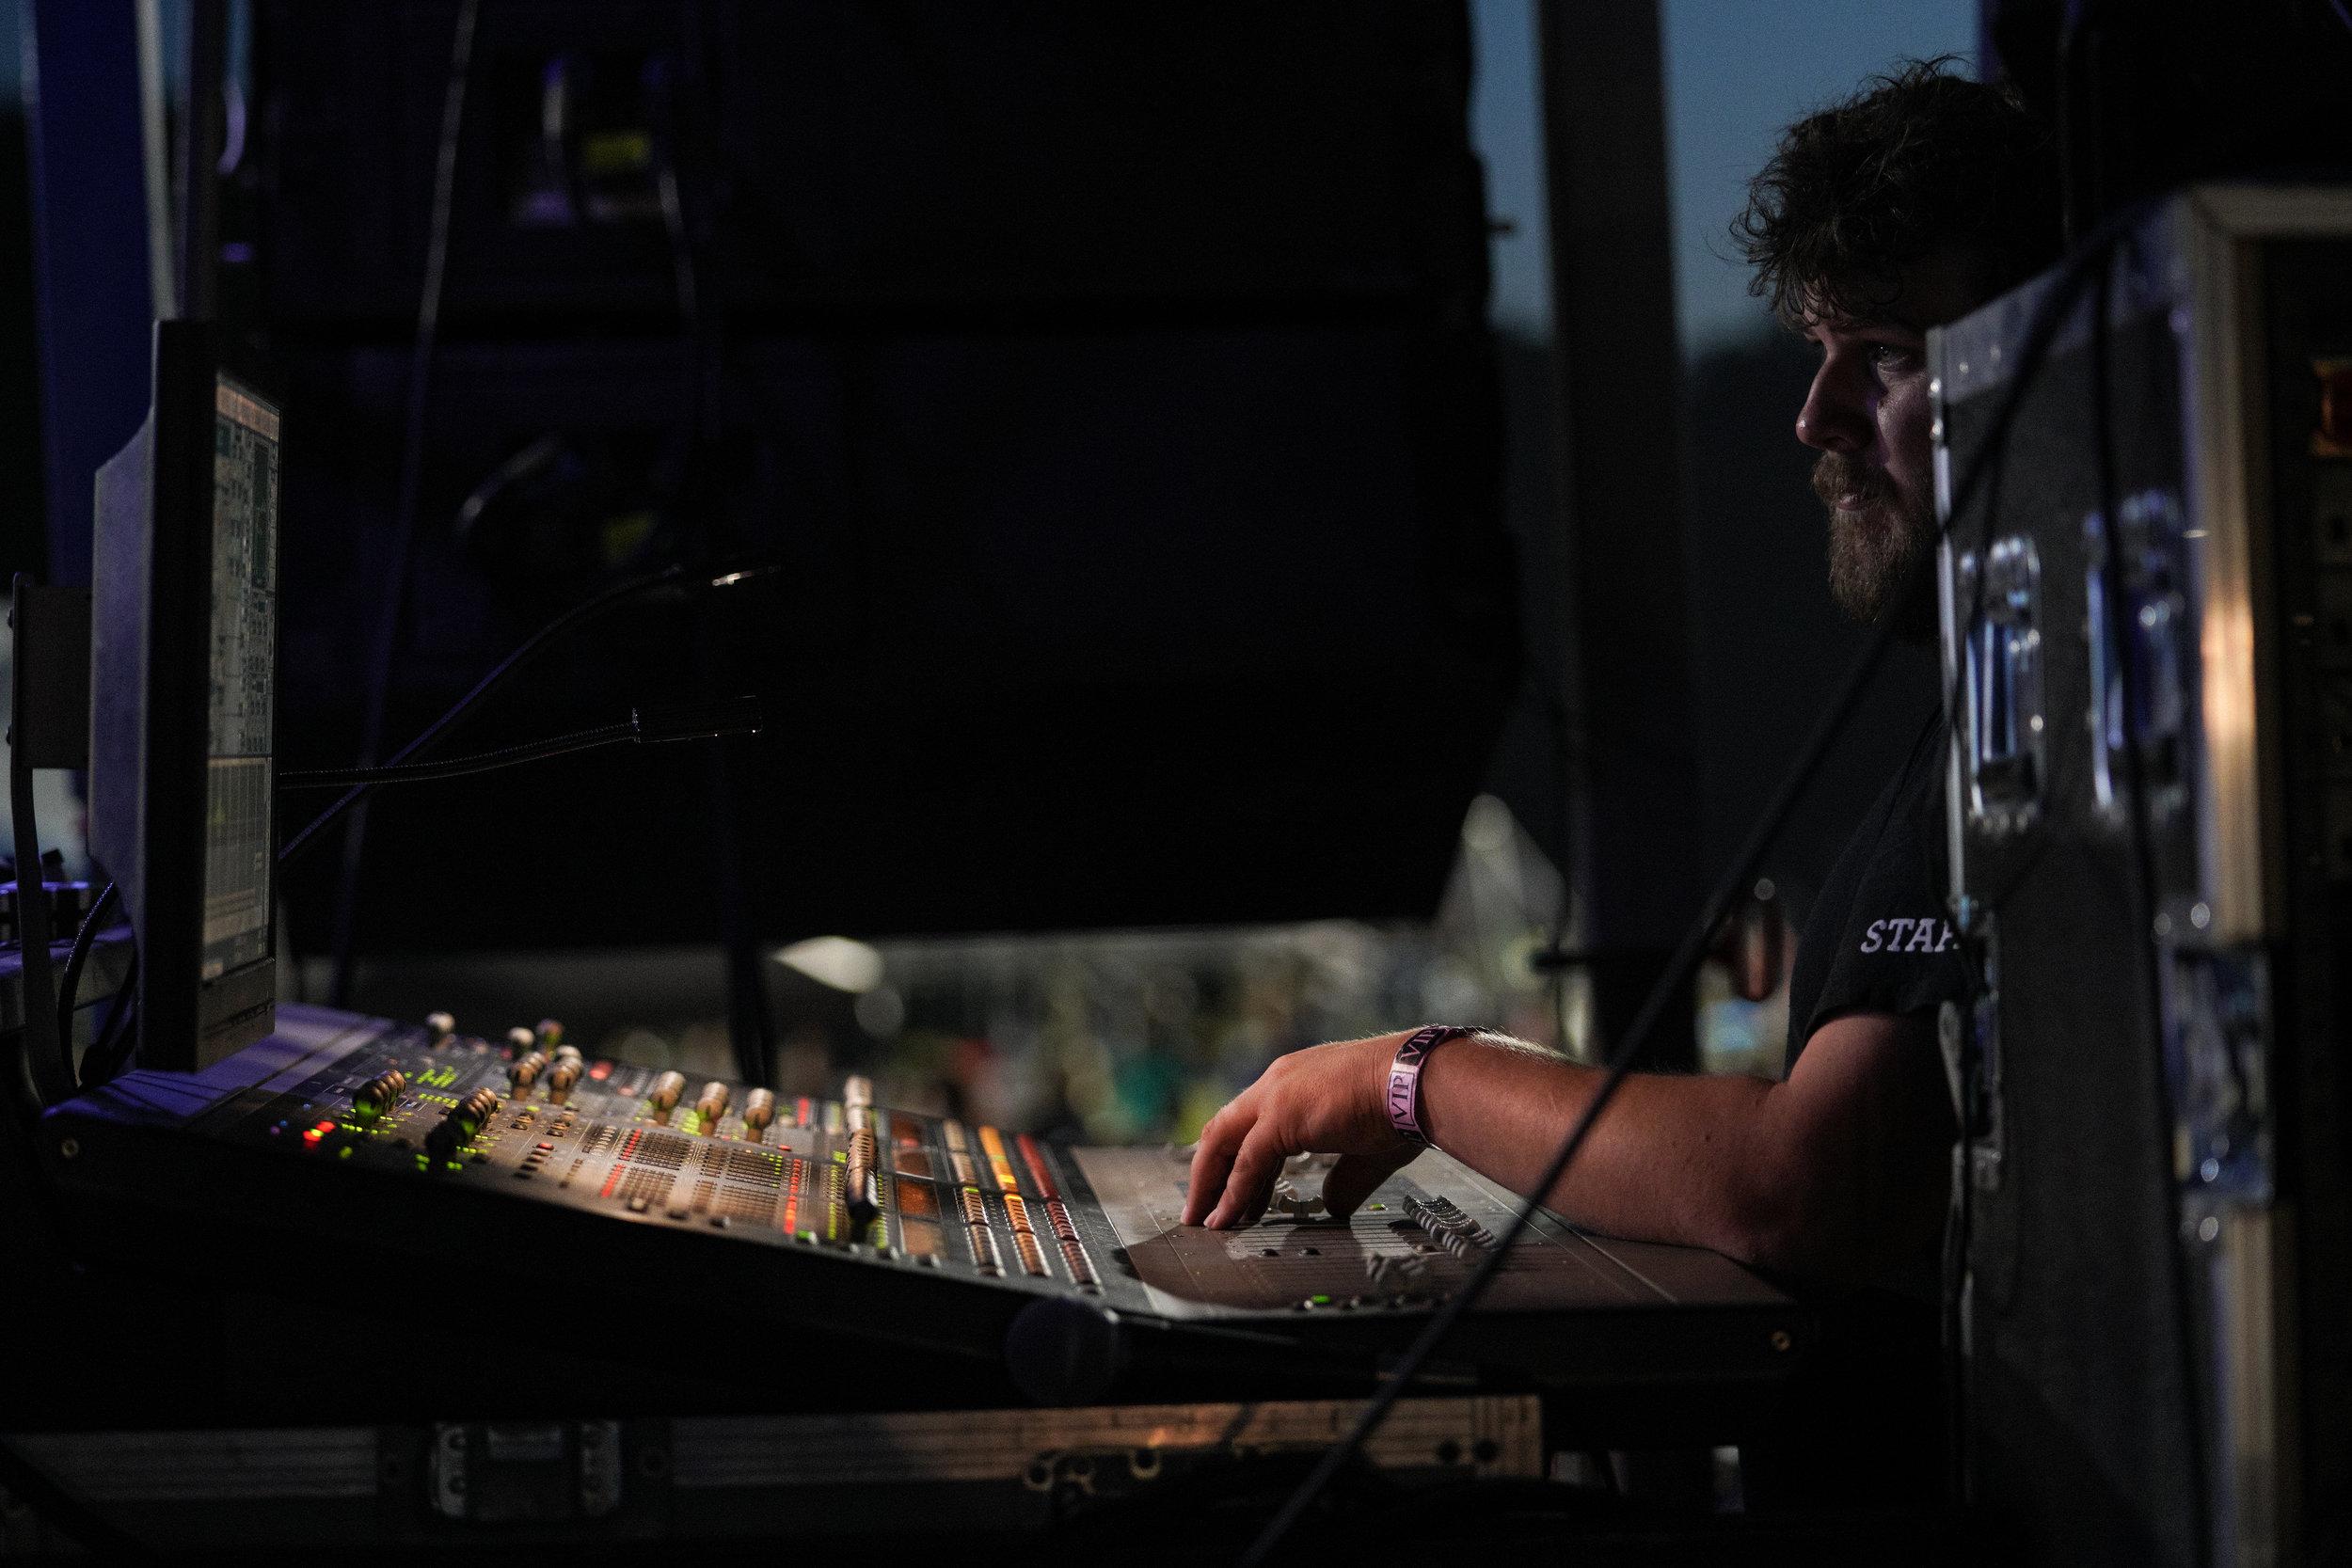 Aaron making it sound good all day long © 2019 Nik Bucci